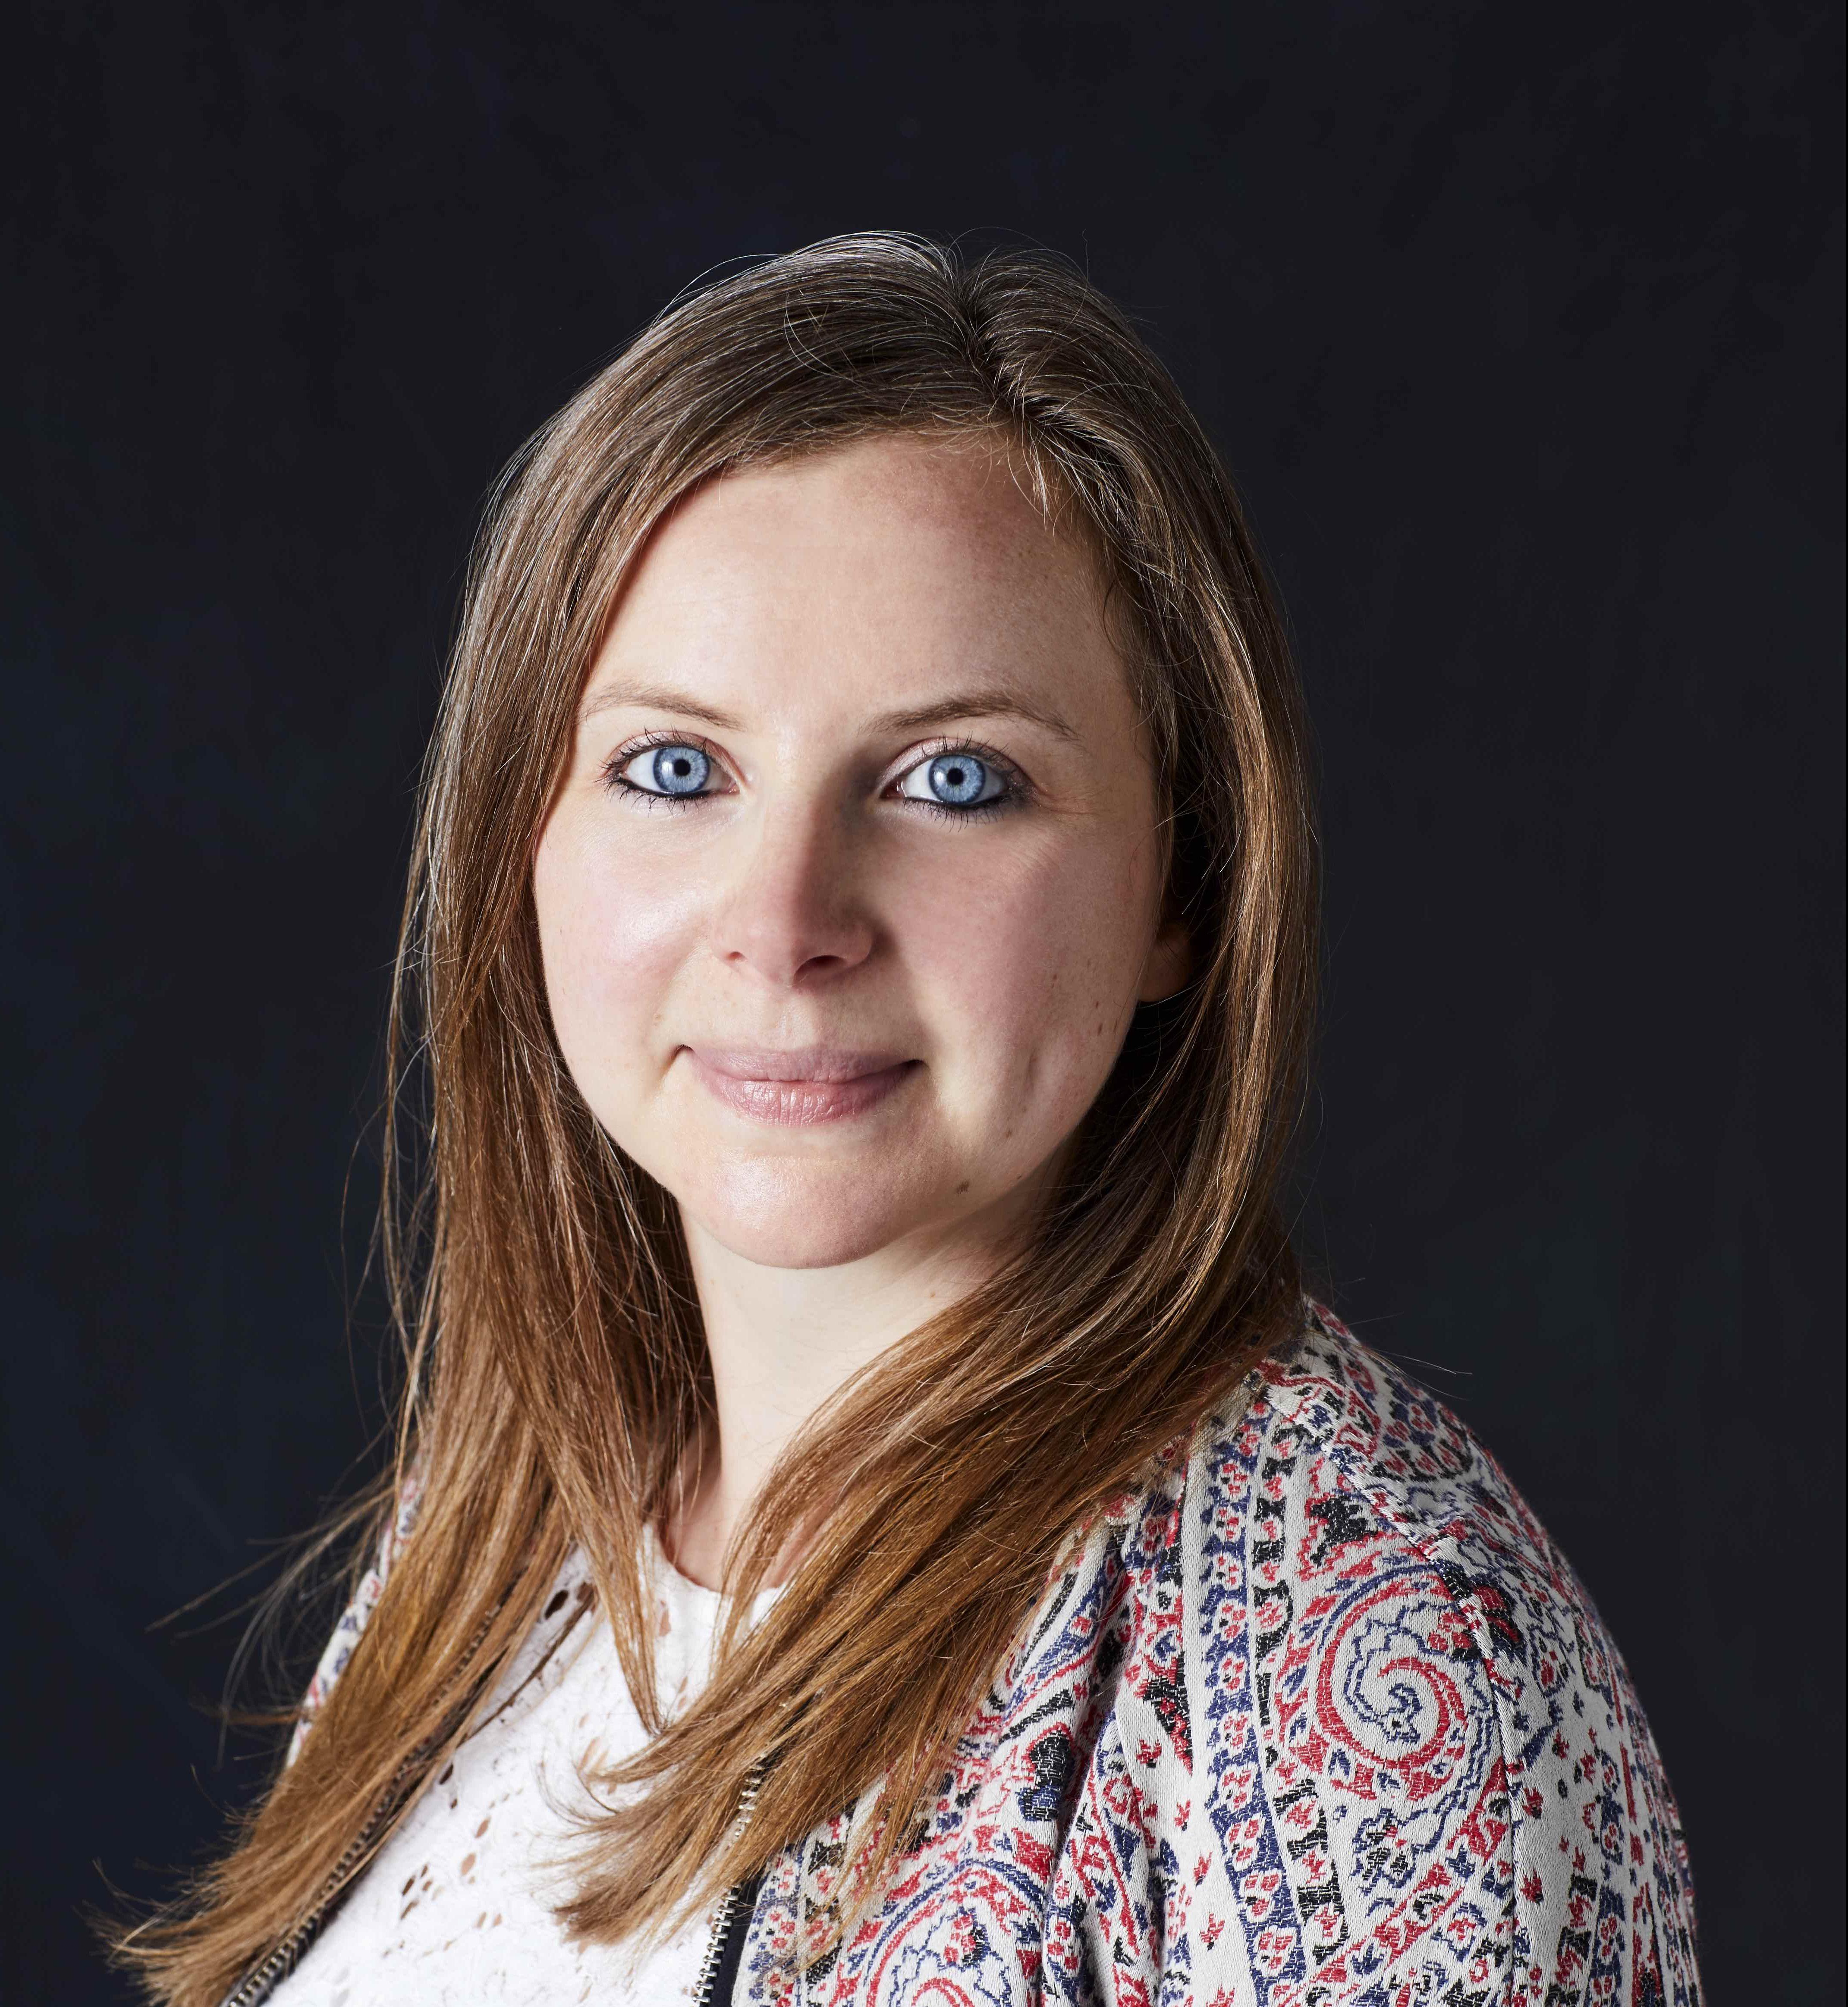 Zoe McFarland Profile Image